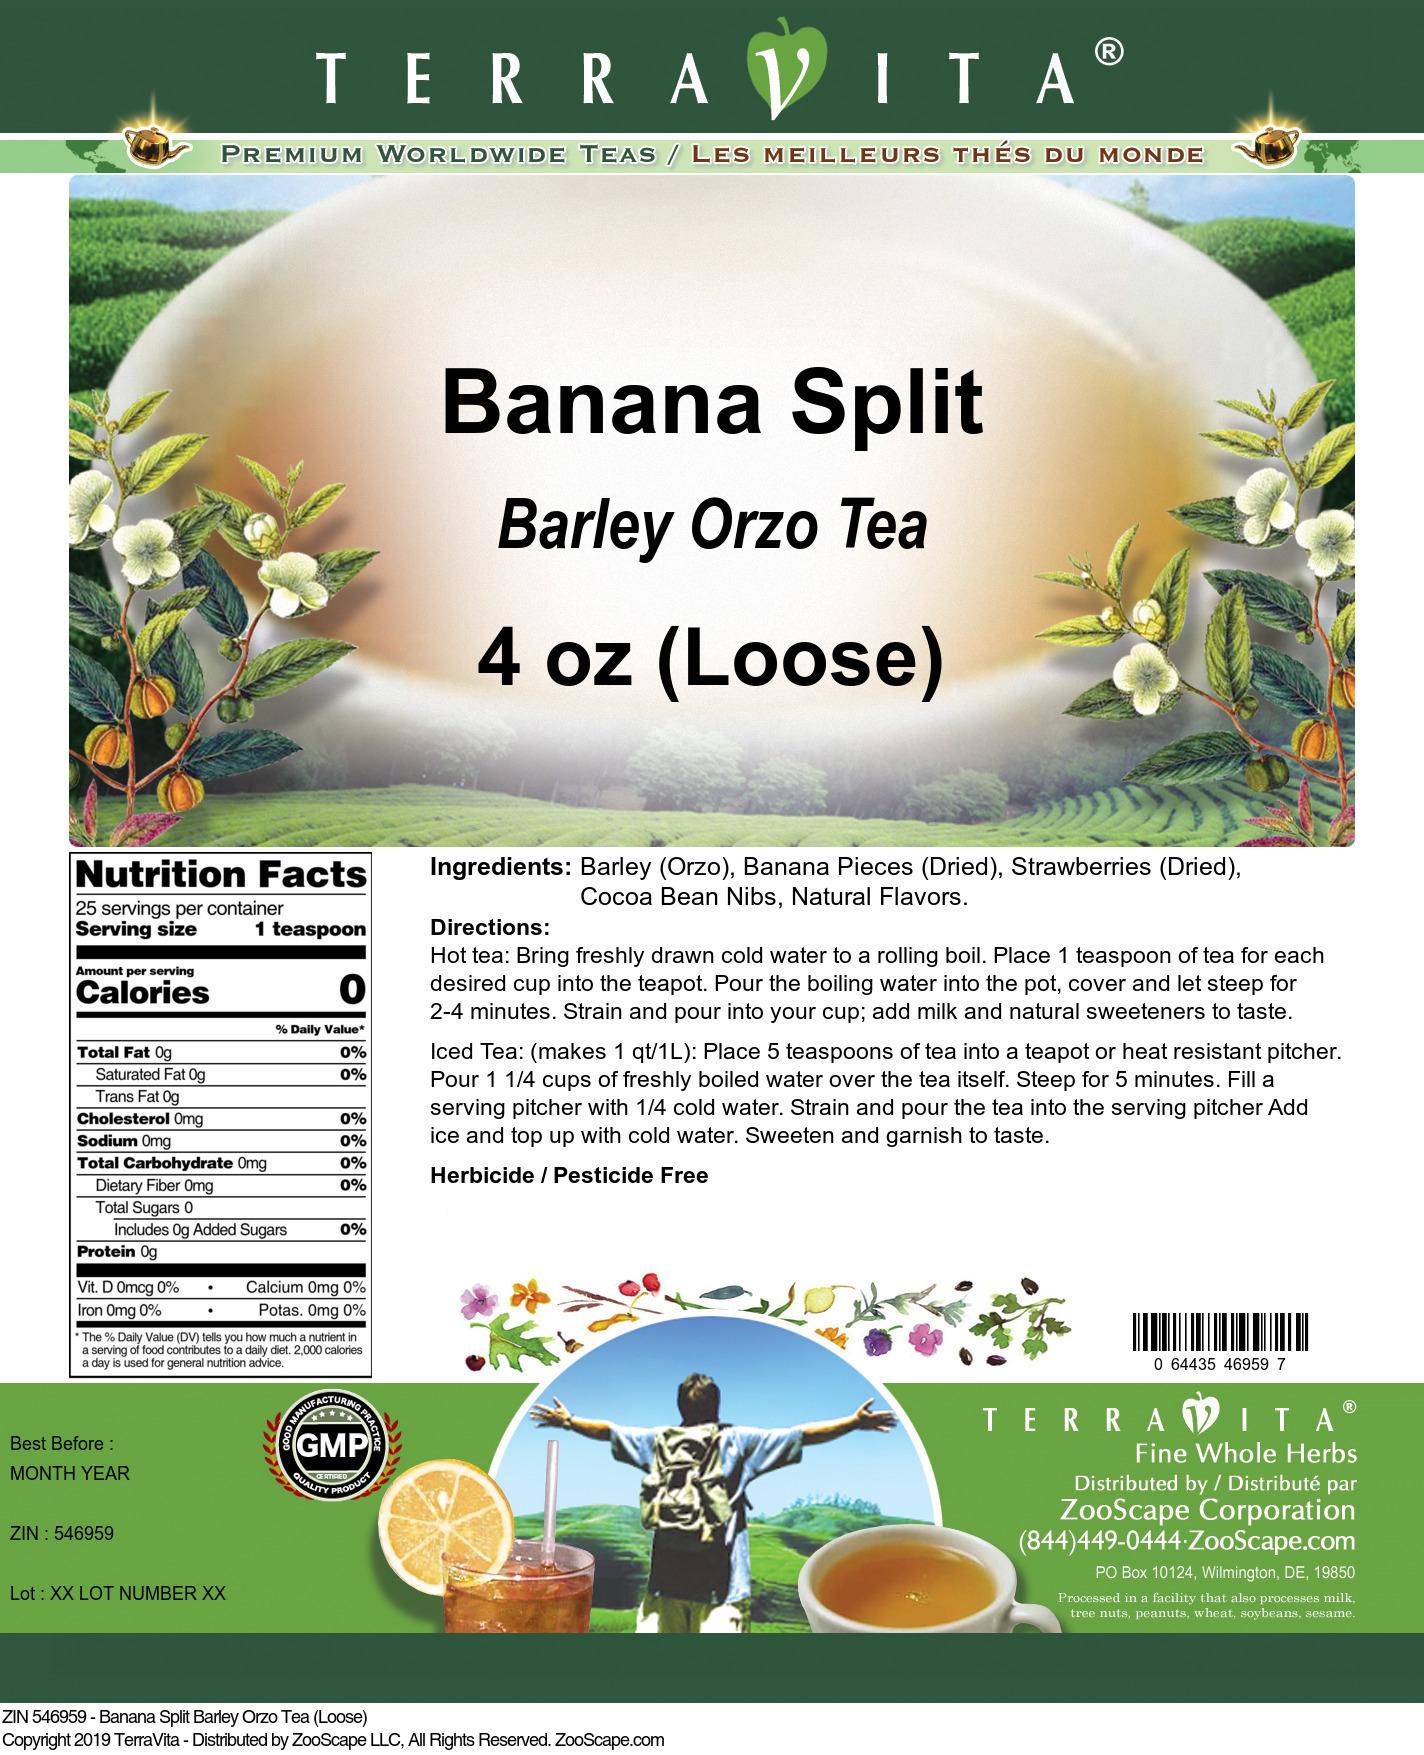 Banana Split Barley Orzo